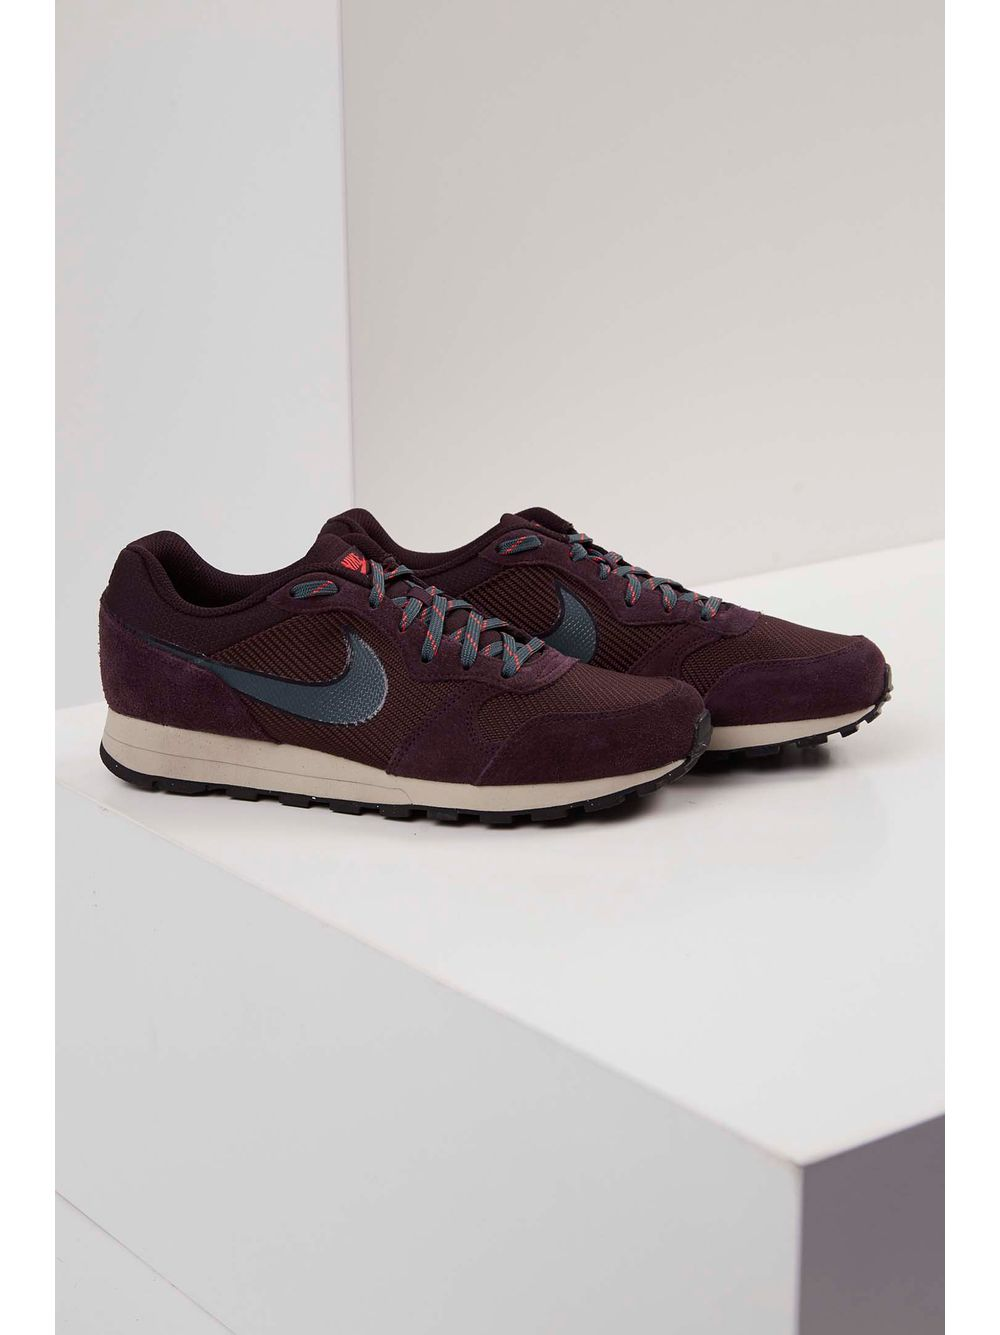 8a72283ac84a3 Tênis Nike Md Runner 2 Se Bordo - pittol